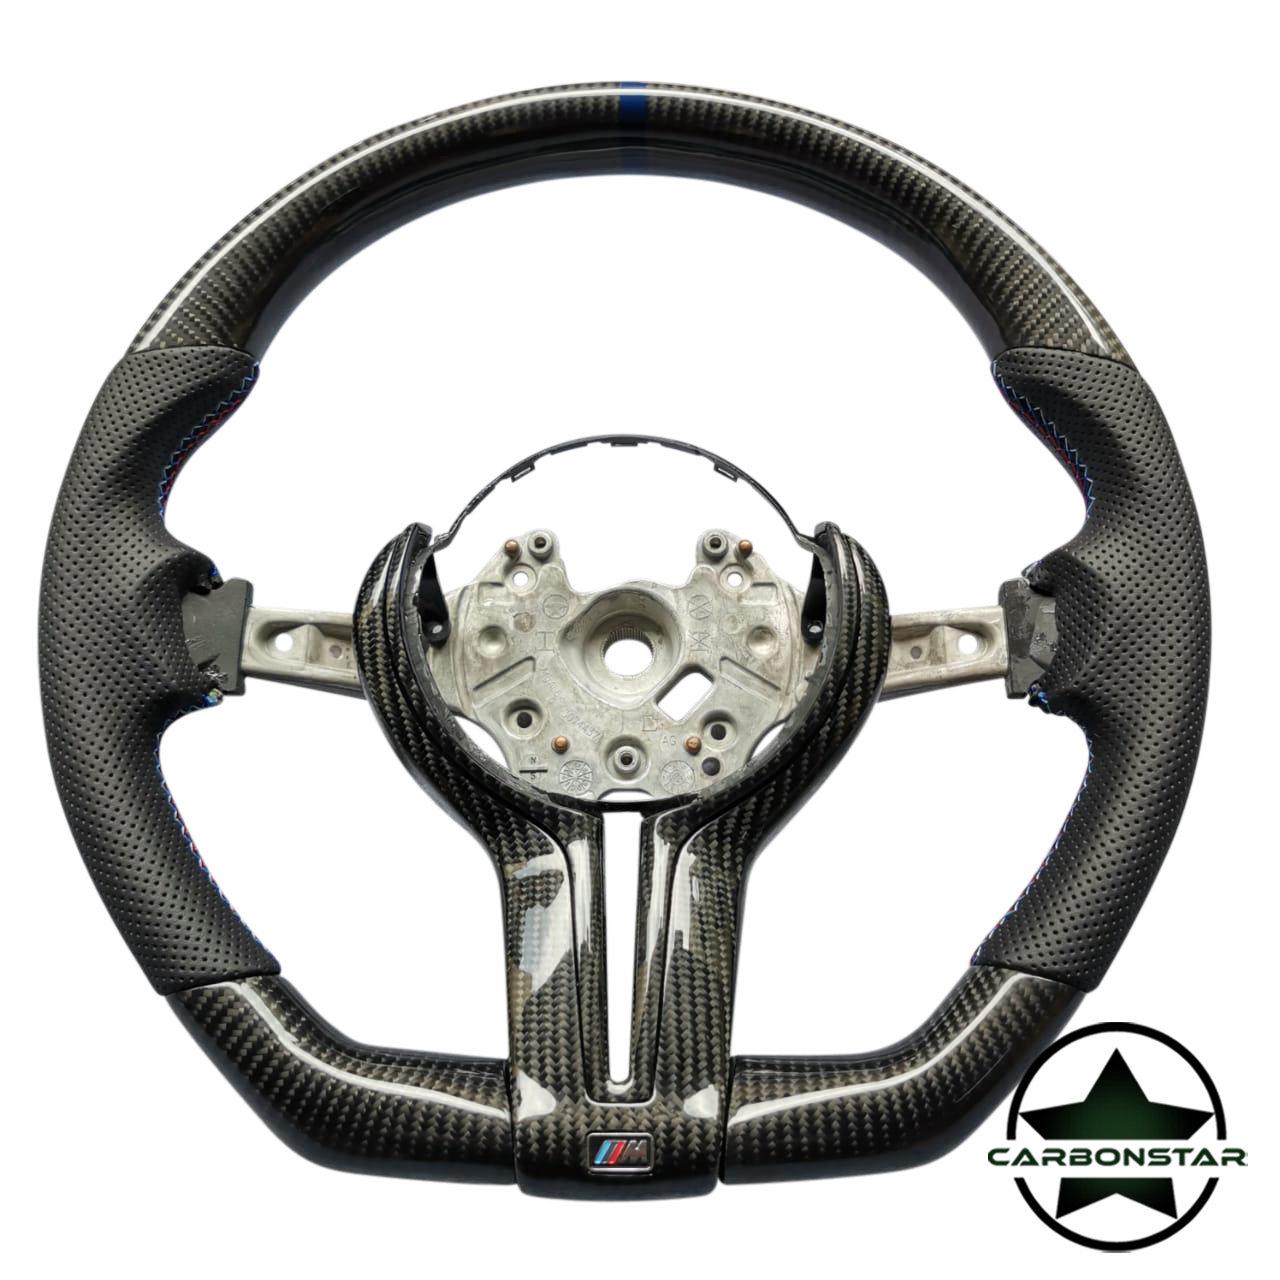 Cstar Carbon Lenkrad abgeflacht OEM inkl. Spange passend für BMW M2 F87 M3 F80 M4 F82 F83 F20 F21 F22 F23 F45 F46 F30 F31 F34 F35 F32 F33 F36 F48 Competition